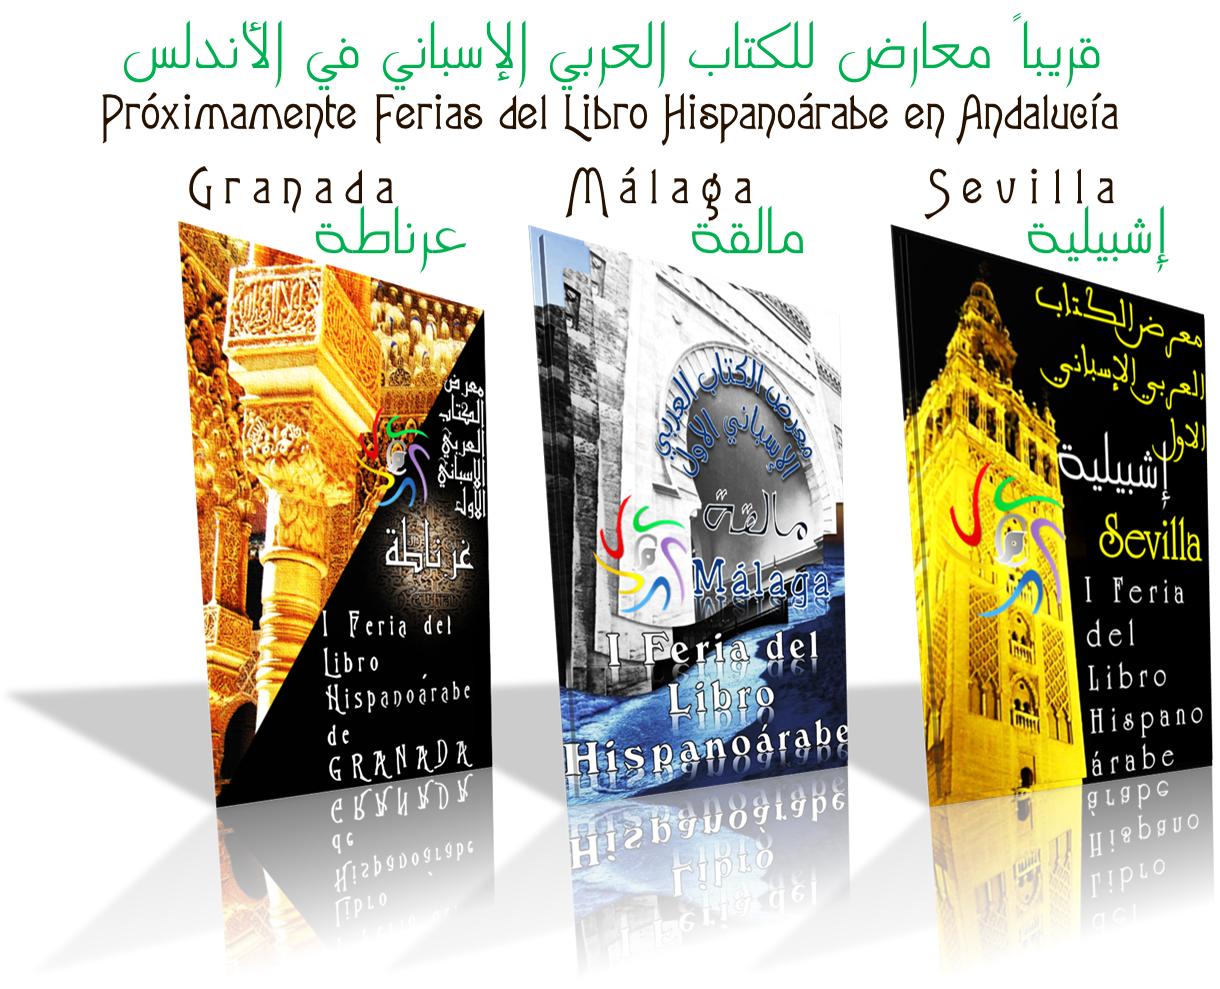 Próximamente Ferias del Libro Hispanoárabe en Andalucía